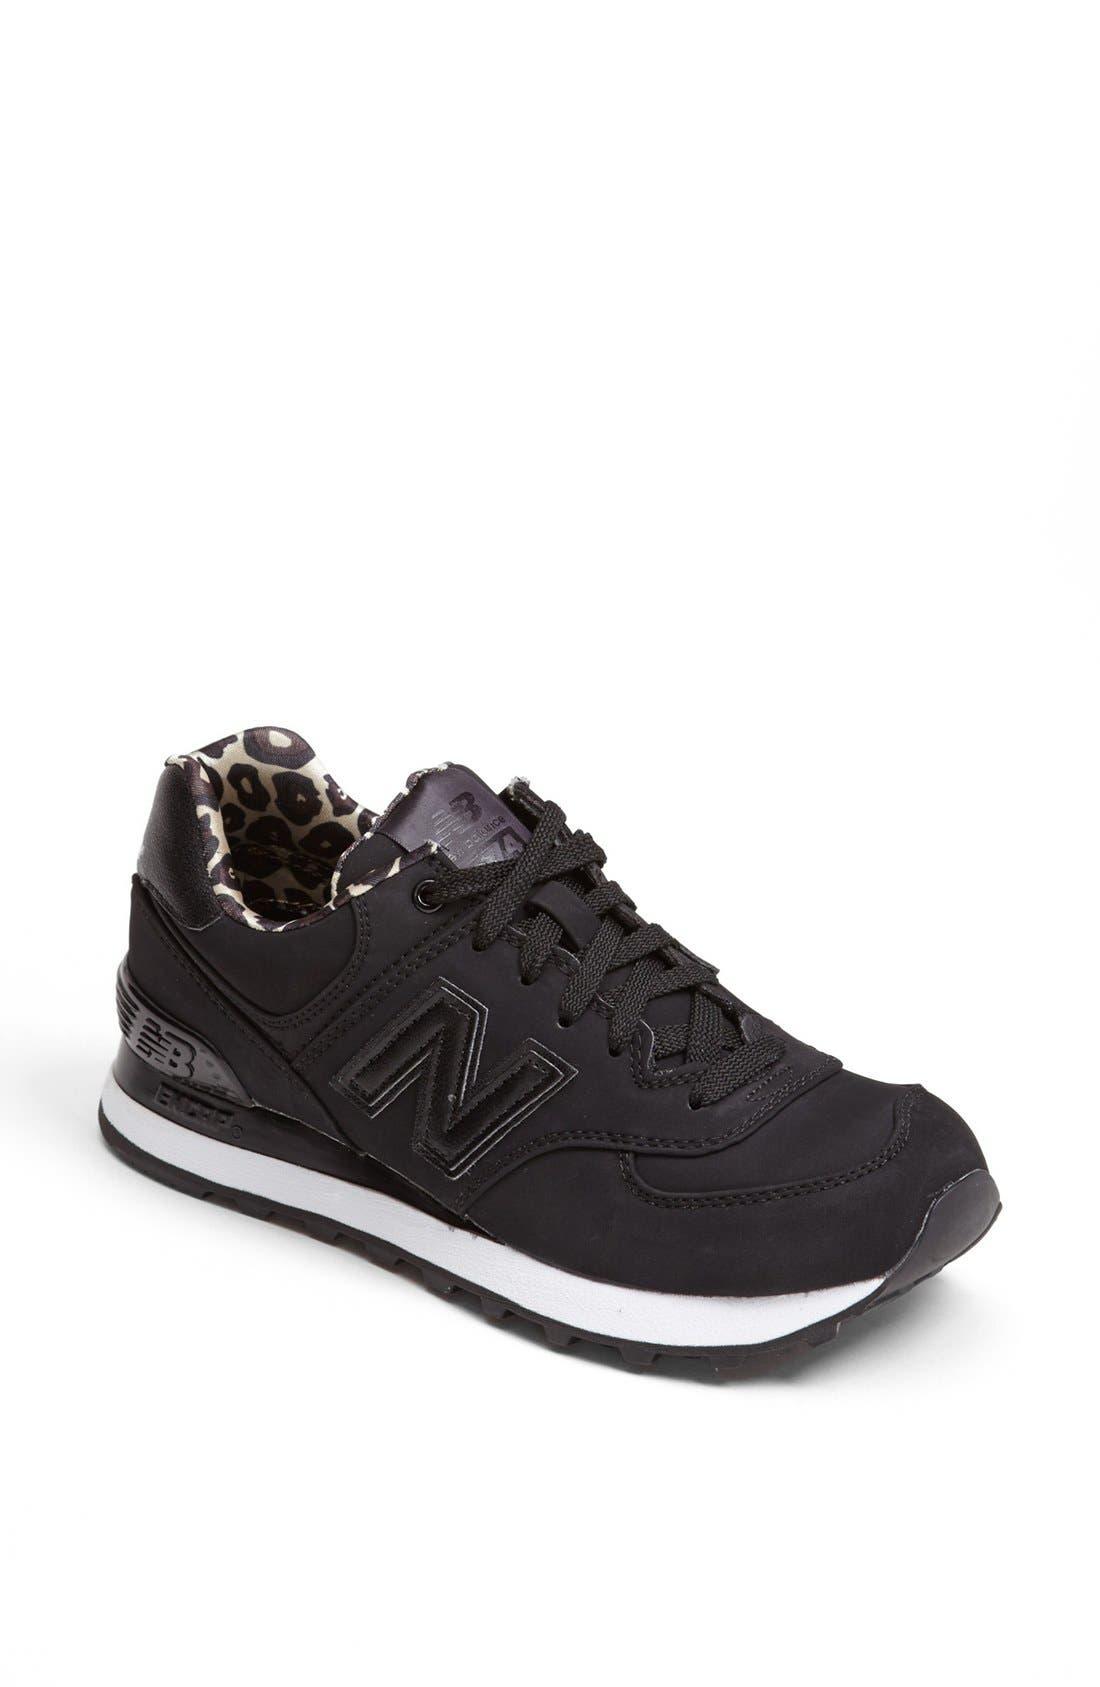 NEW BALANCE '574' Sneaker, Main, color, 001